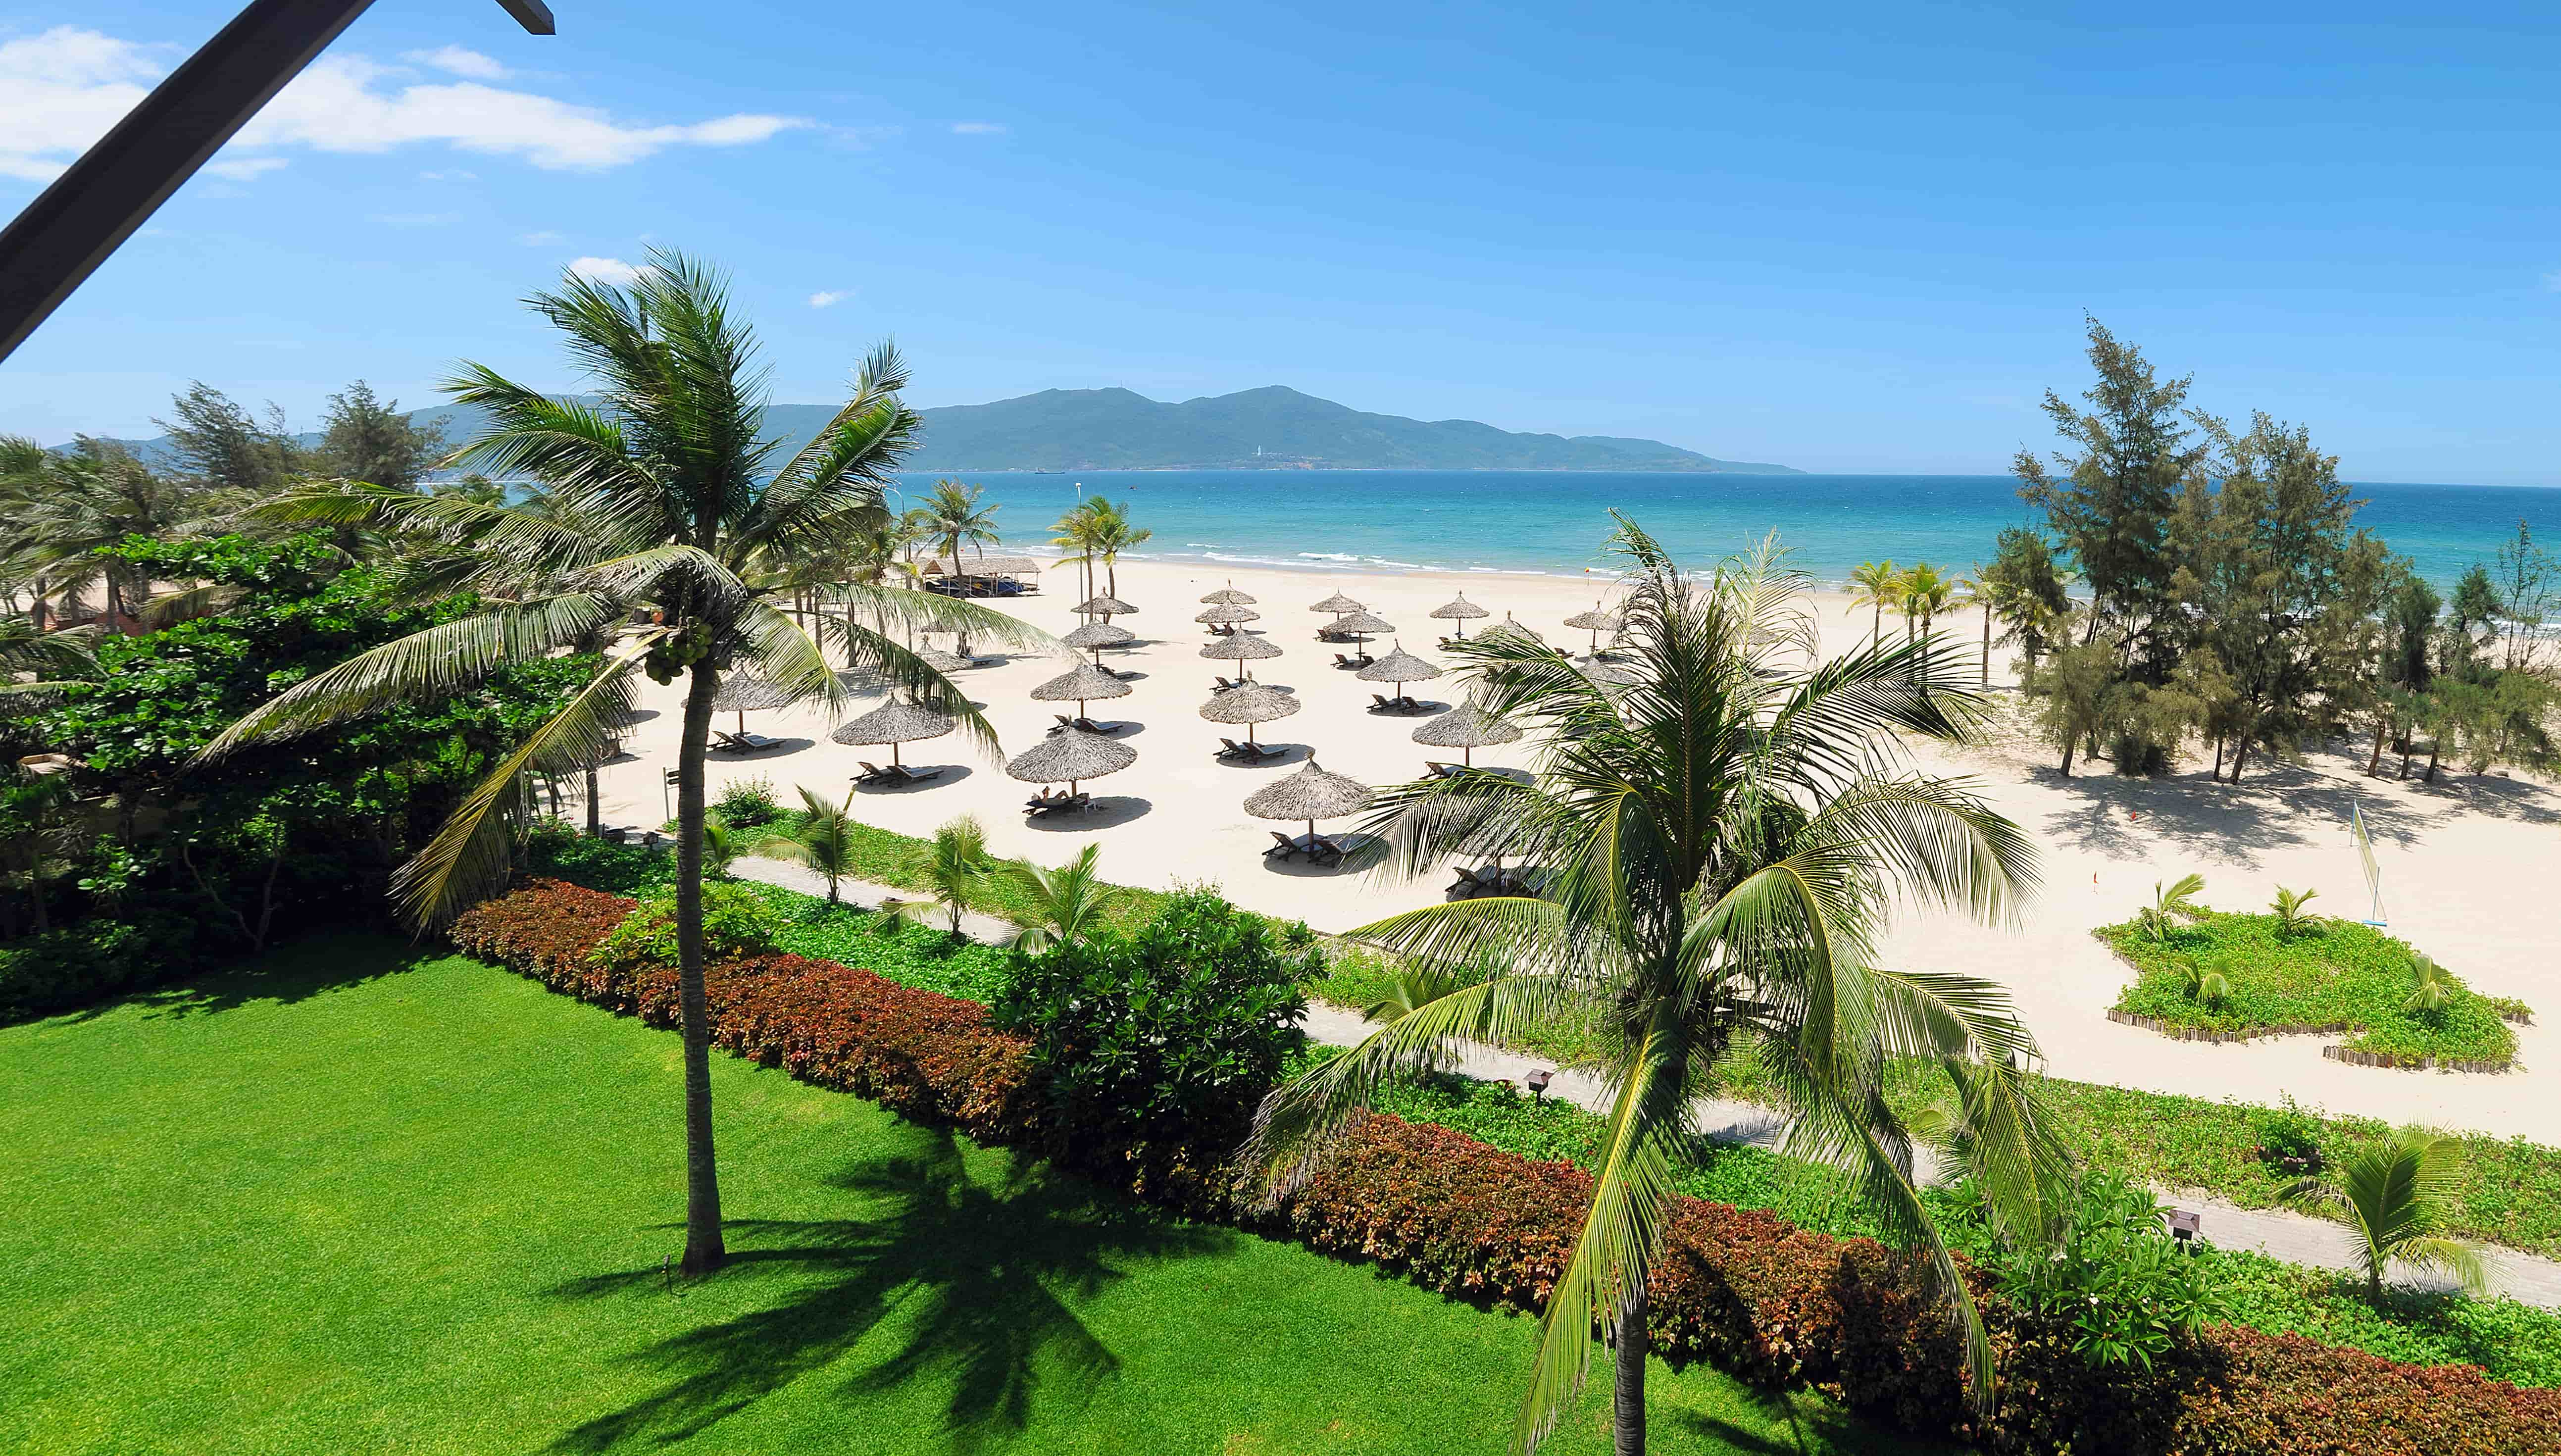 Furama Resort - Vietnam's most prestigious resort - Perfect for your Destination Wedding - WeddingsAbroad.com